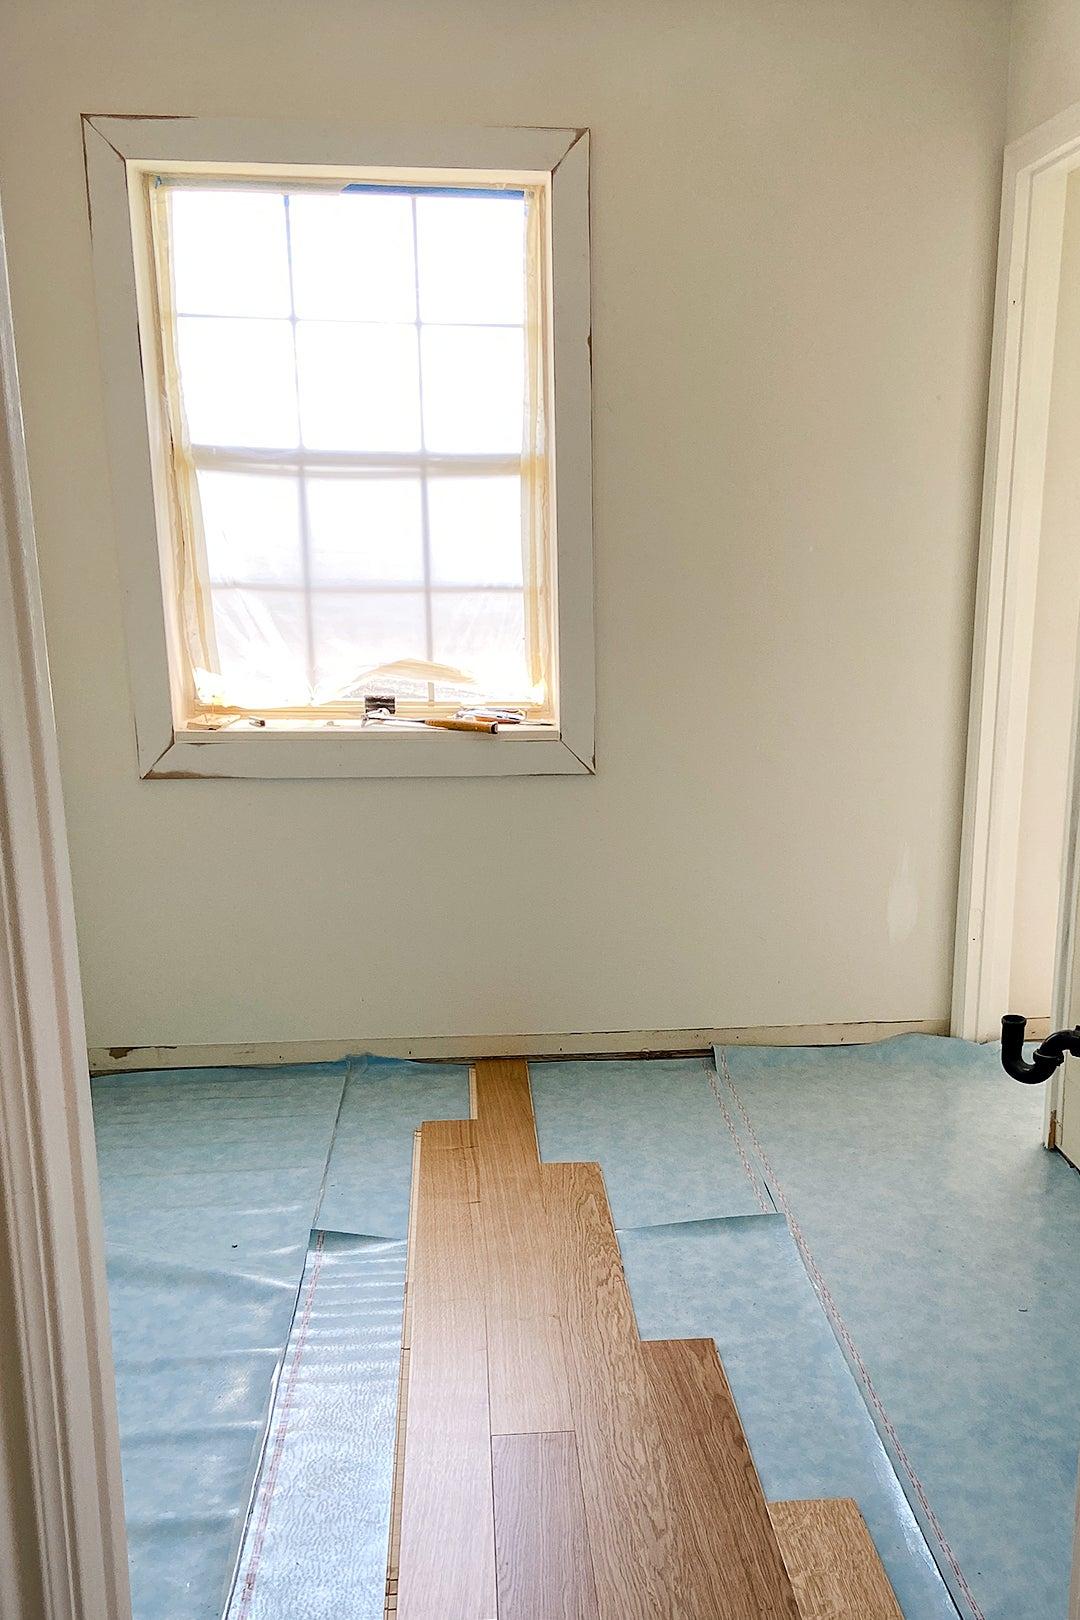 bethroom before image